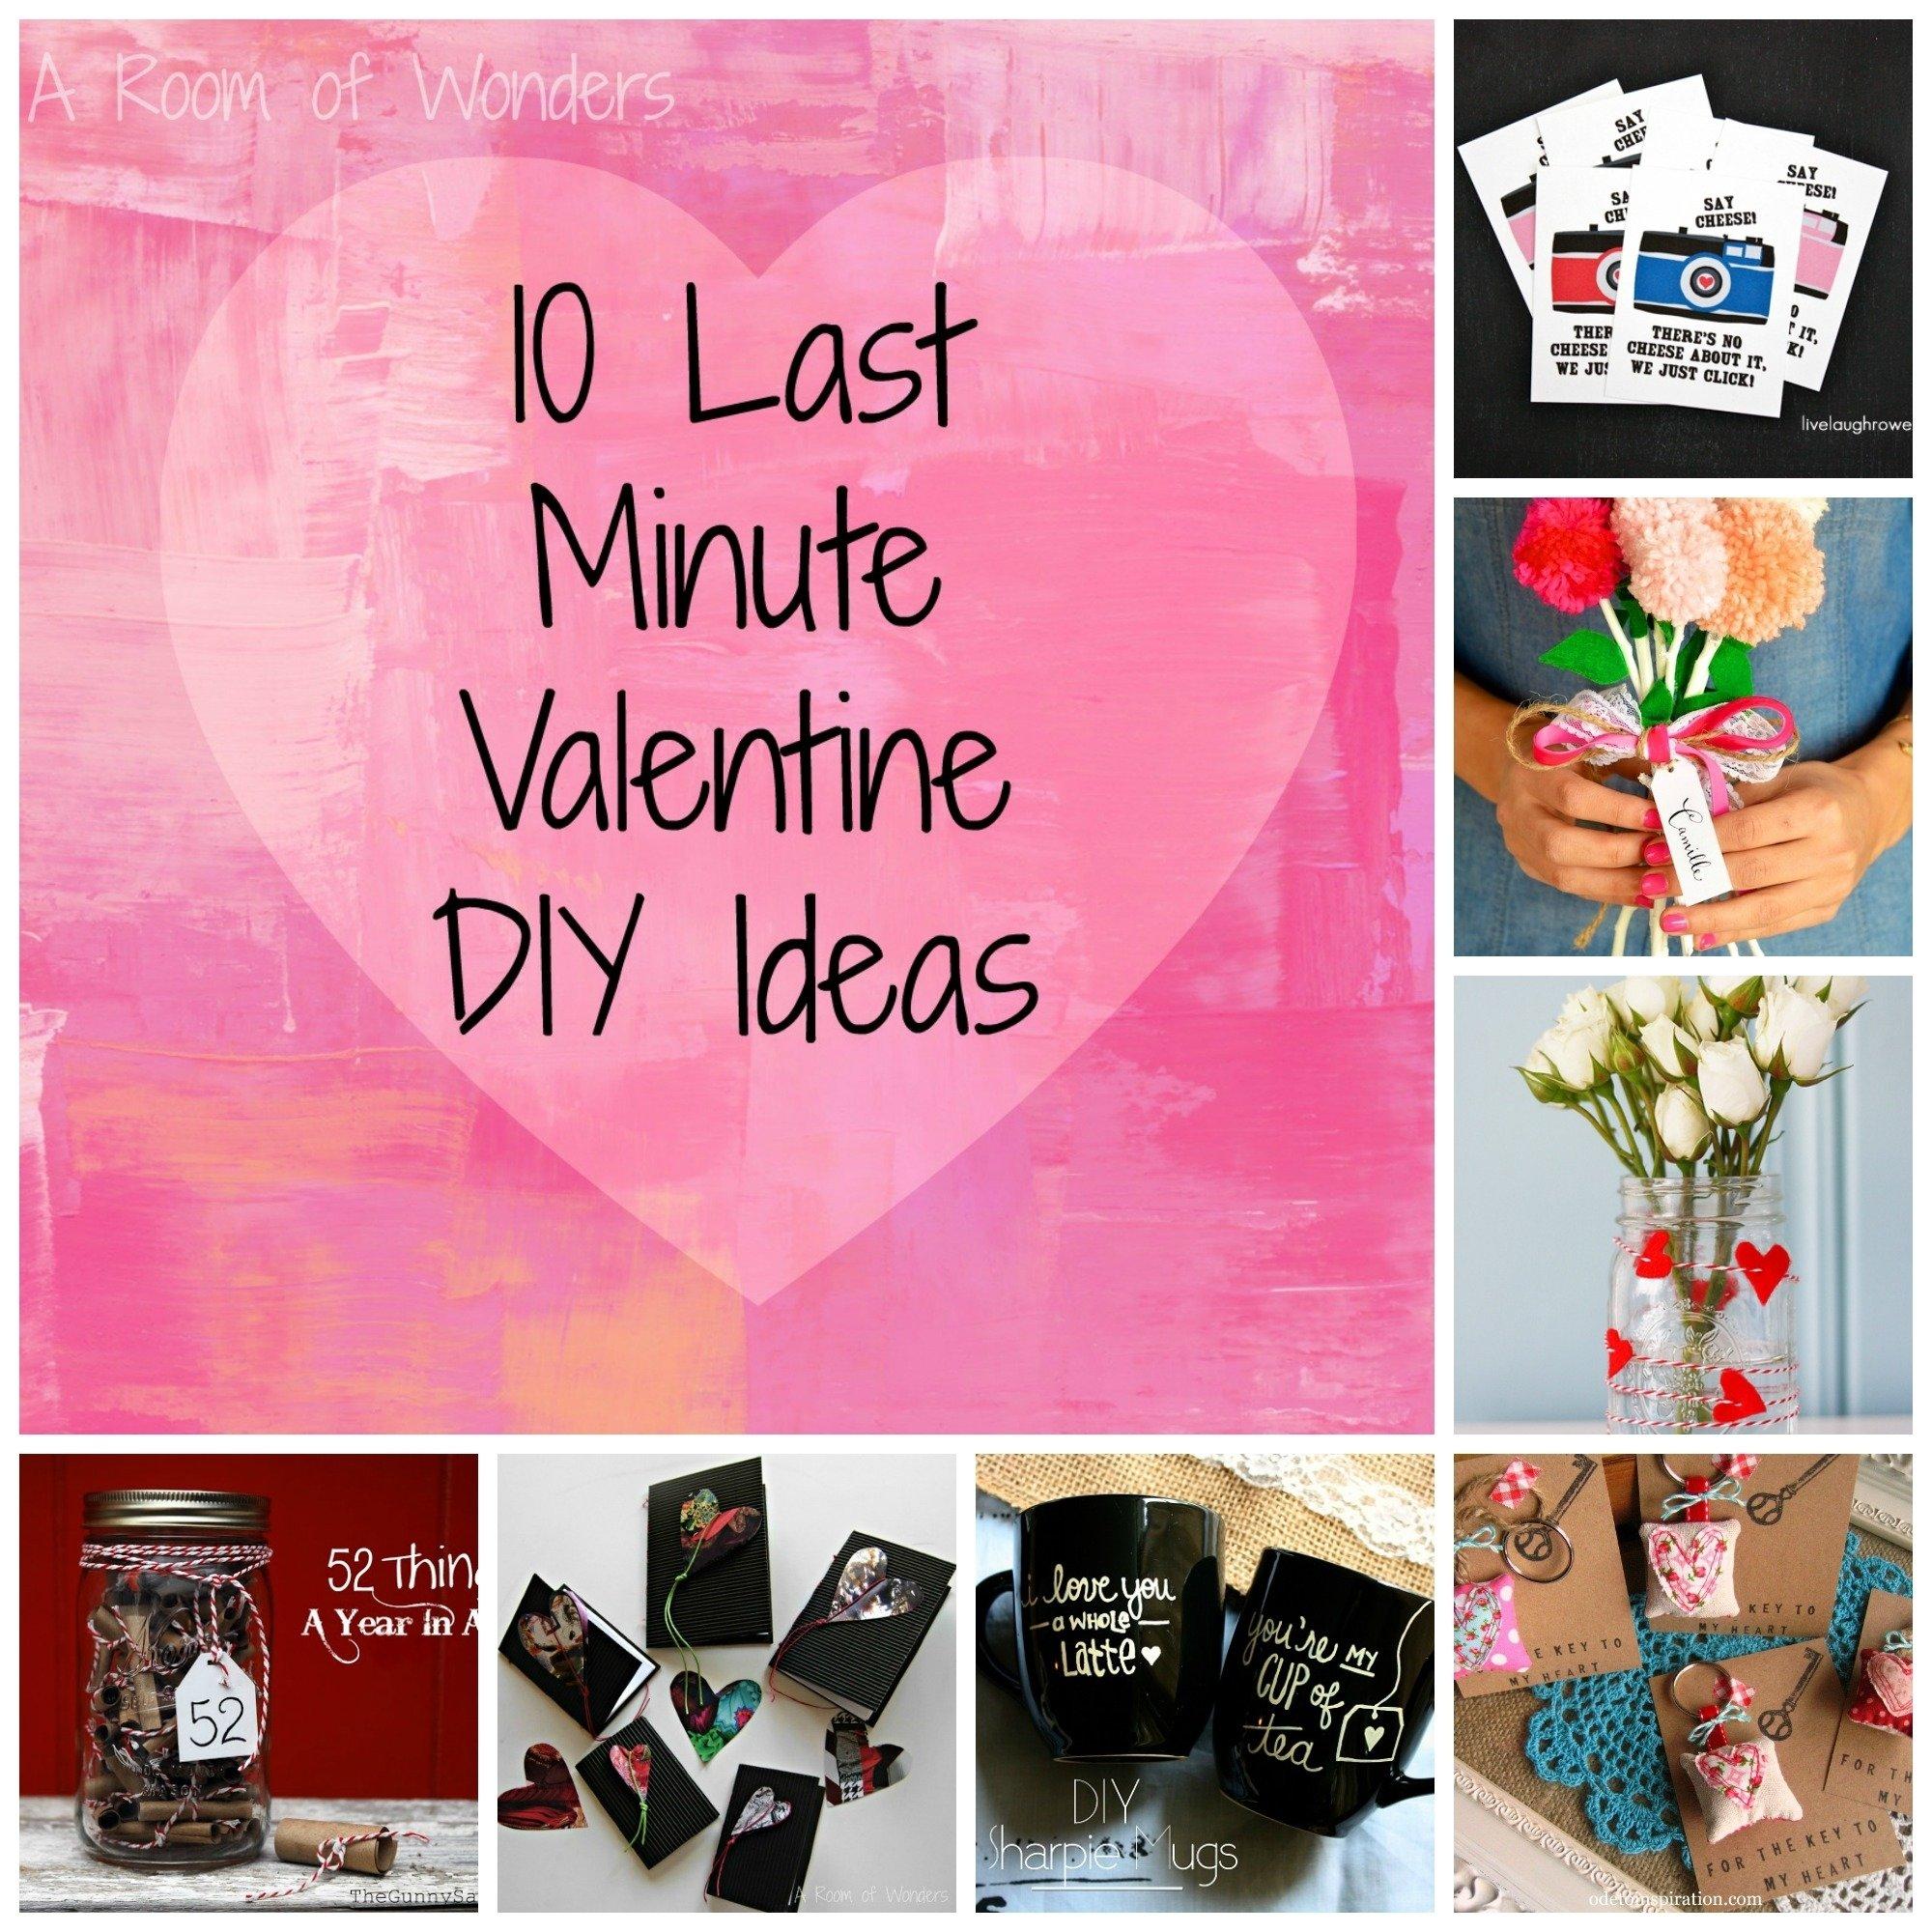 10 Amazing Valentine Craft Ideas For Him anniversary craft ideas for him diy gift ideas for your diy 2020